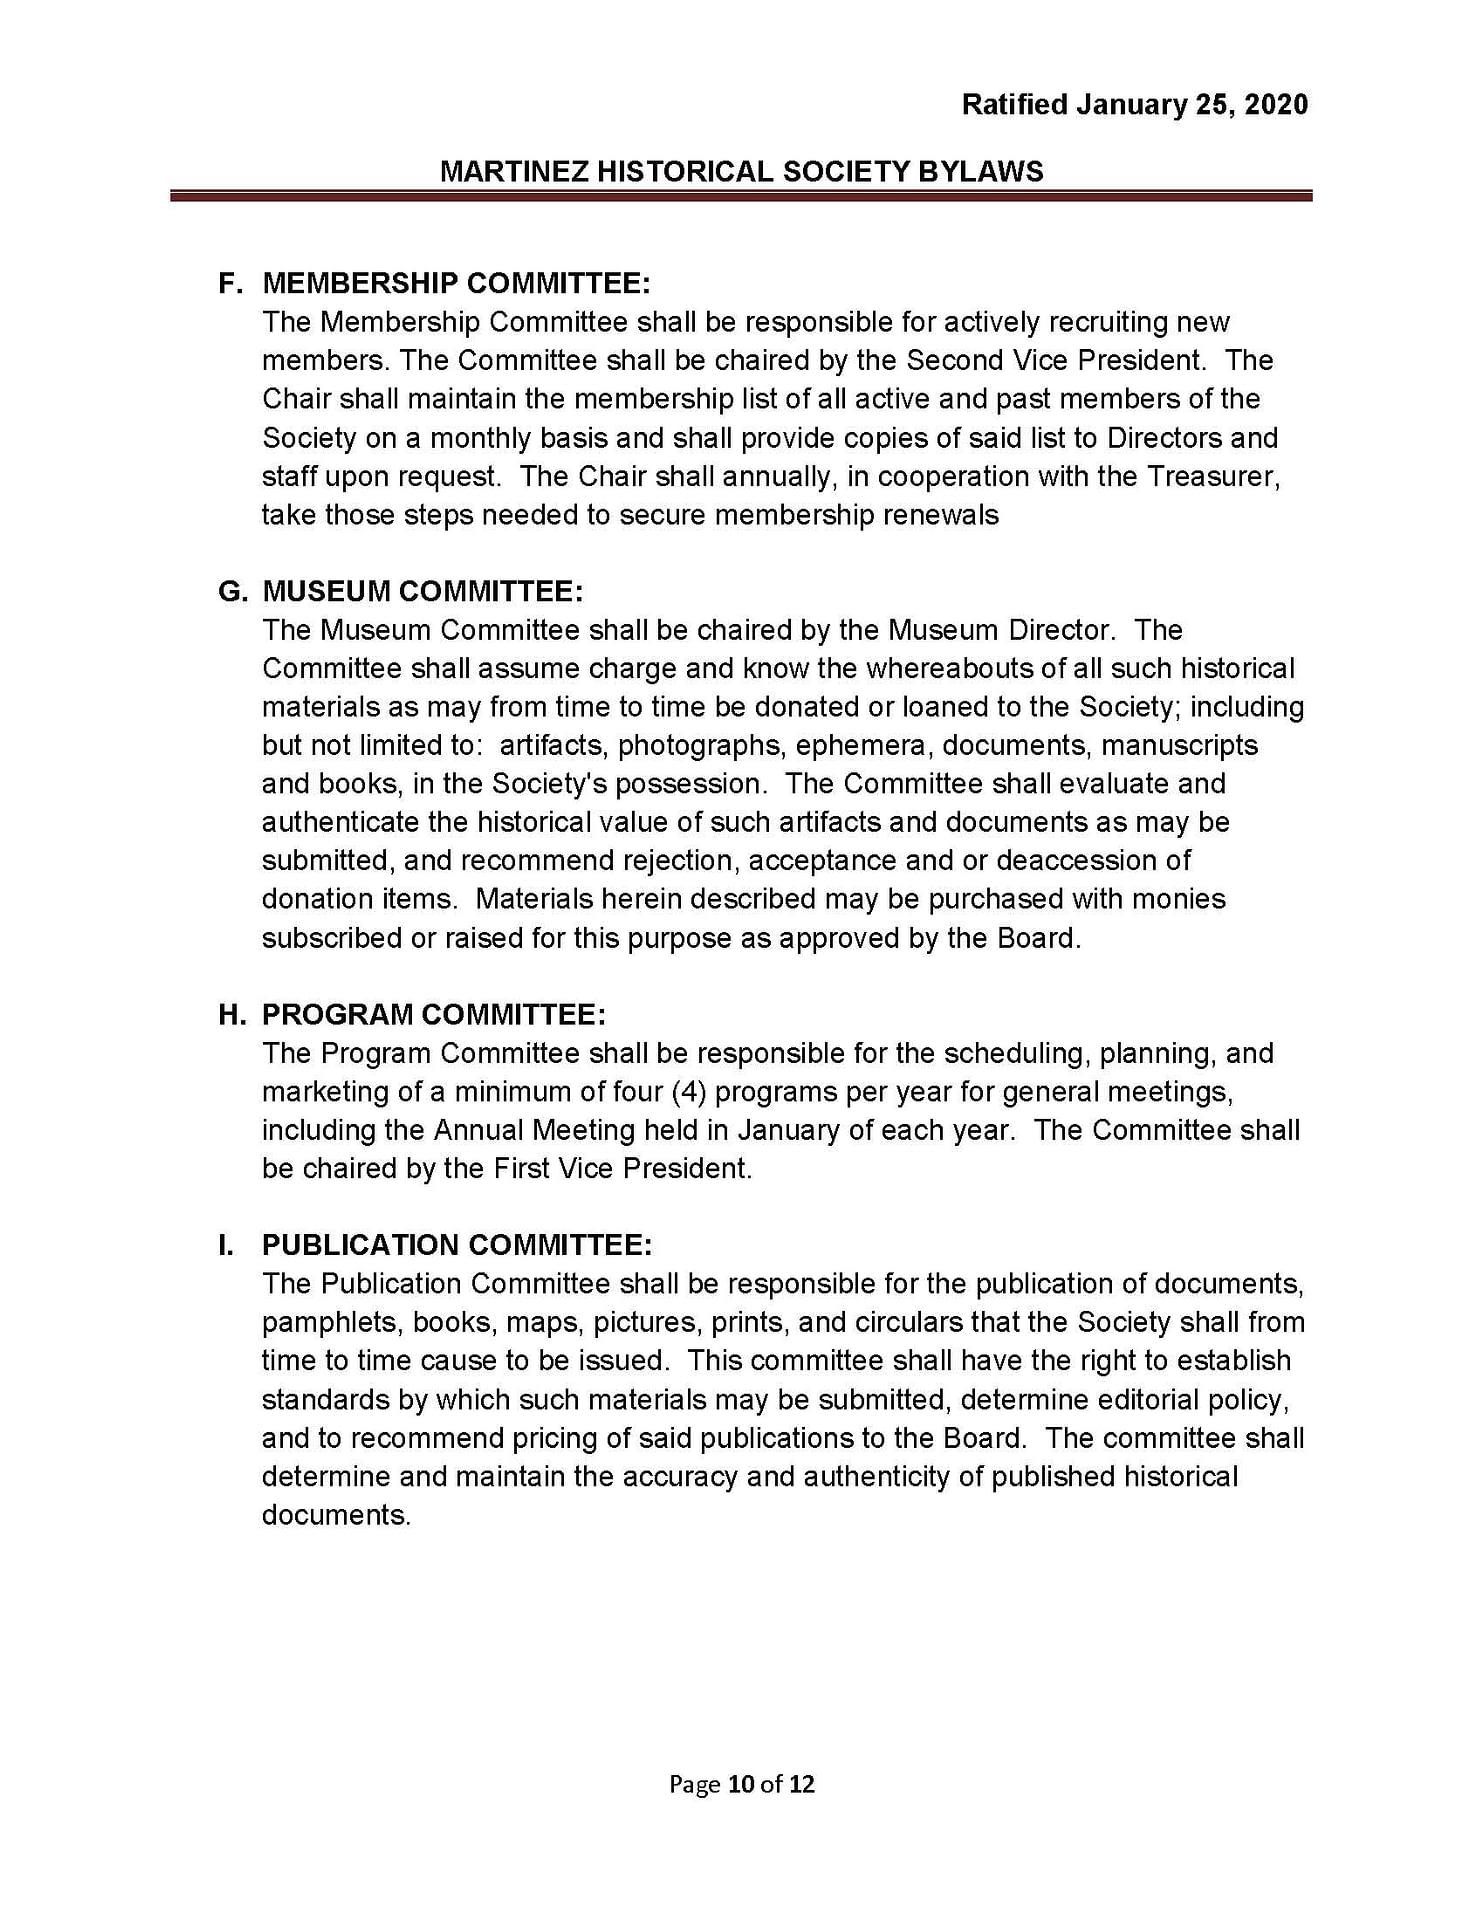 MHS Bylaws Rev 2020-01_Page_10